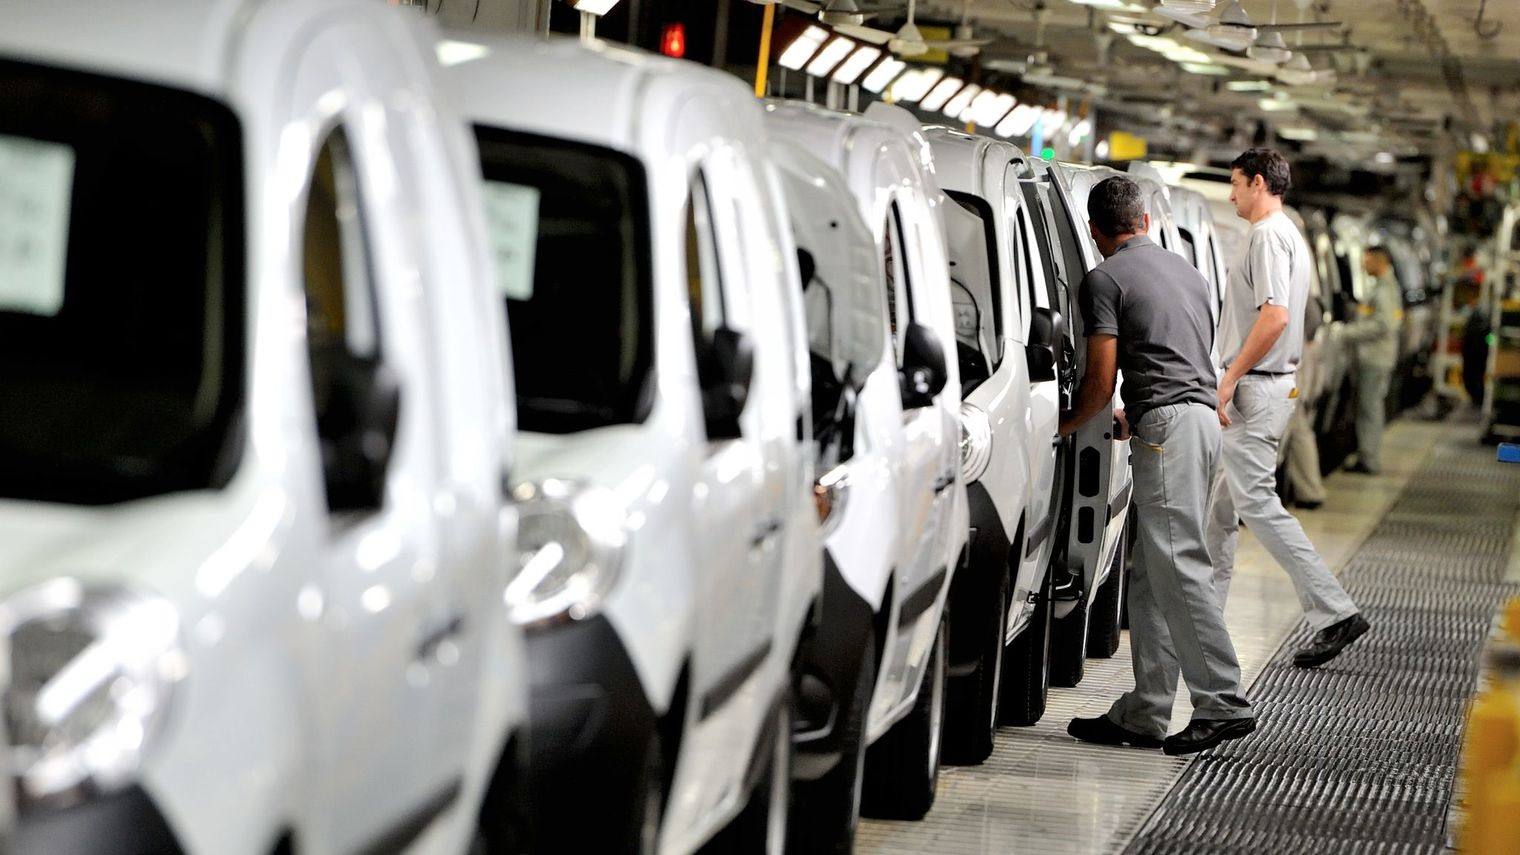 employes-renault-usine-recrutement-france-2016